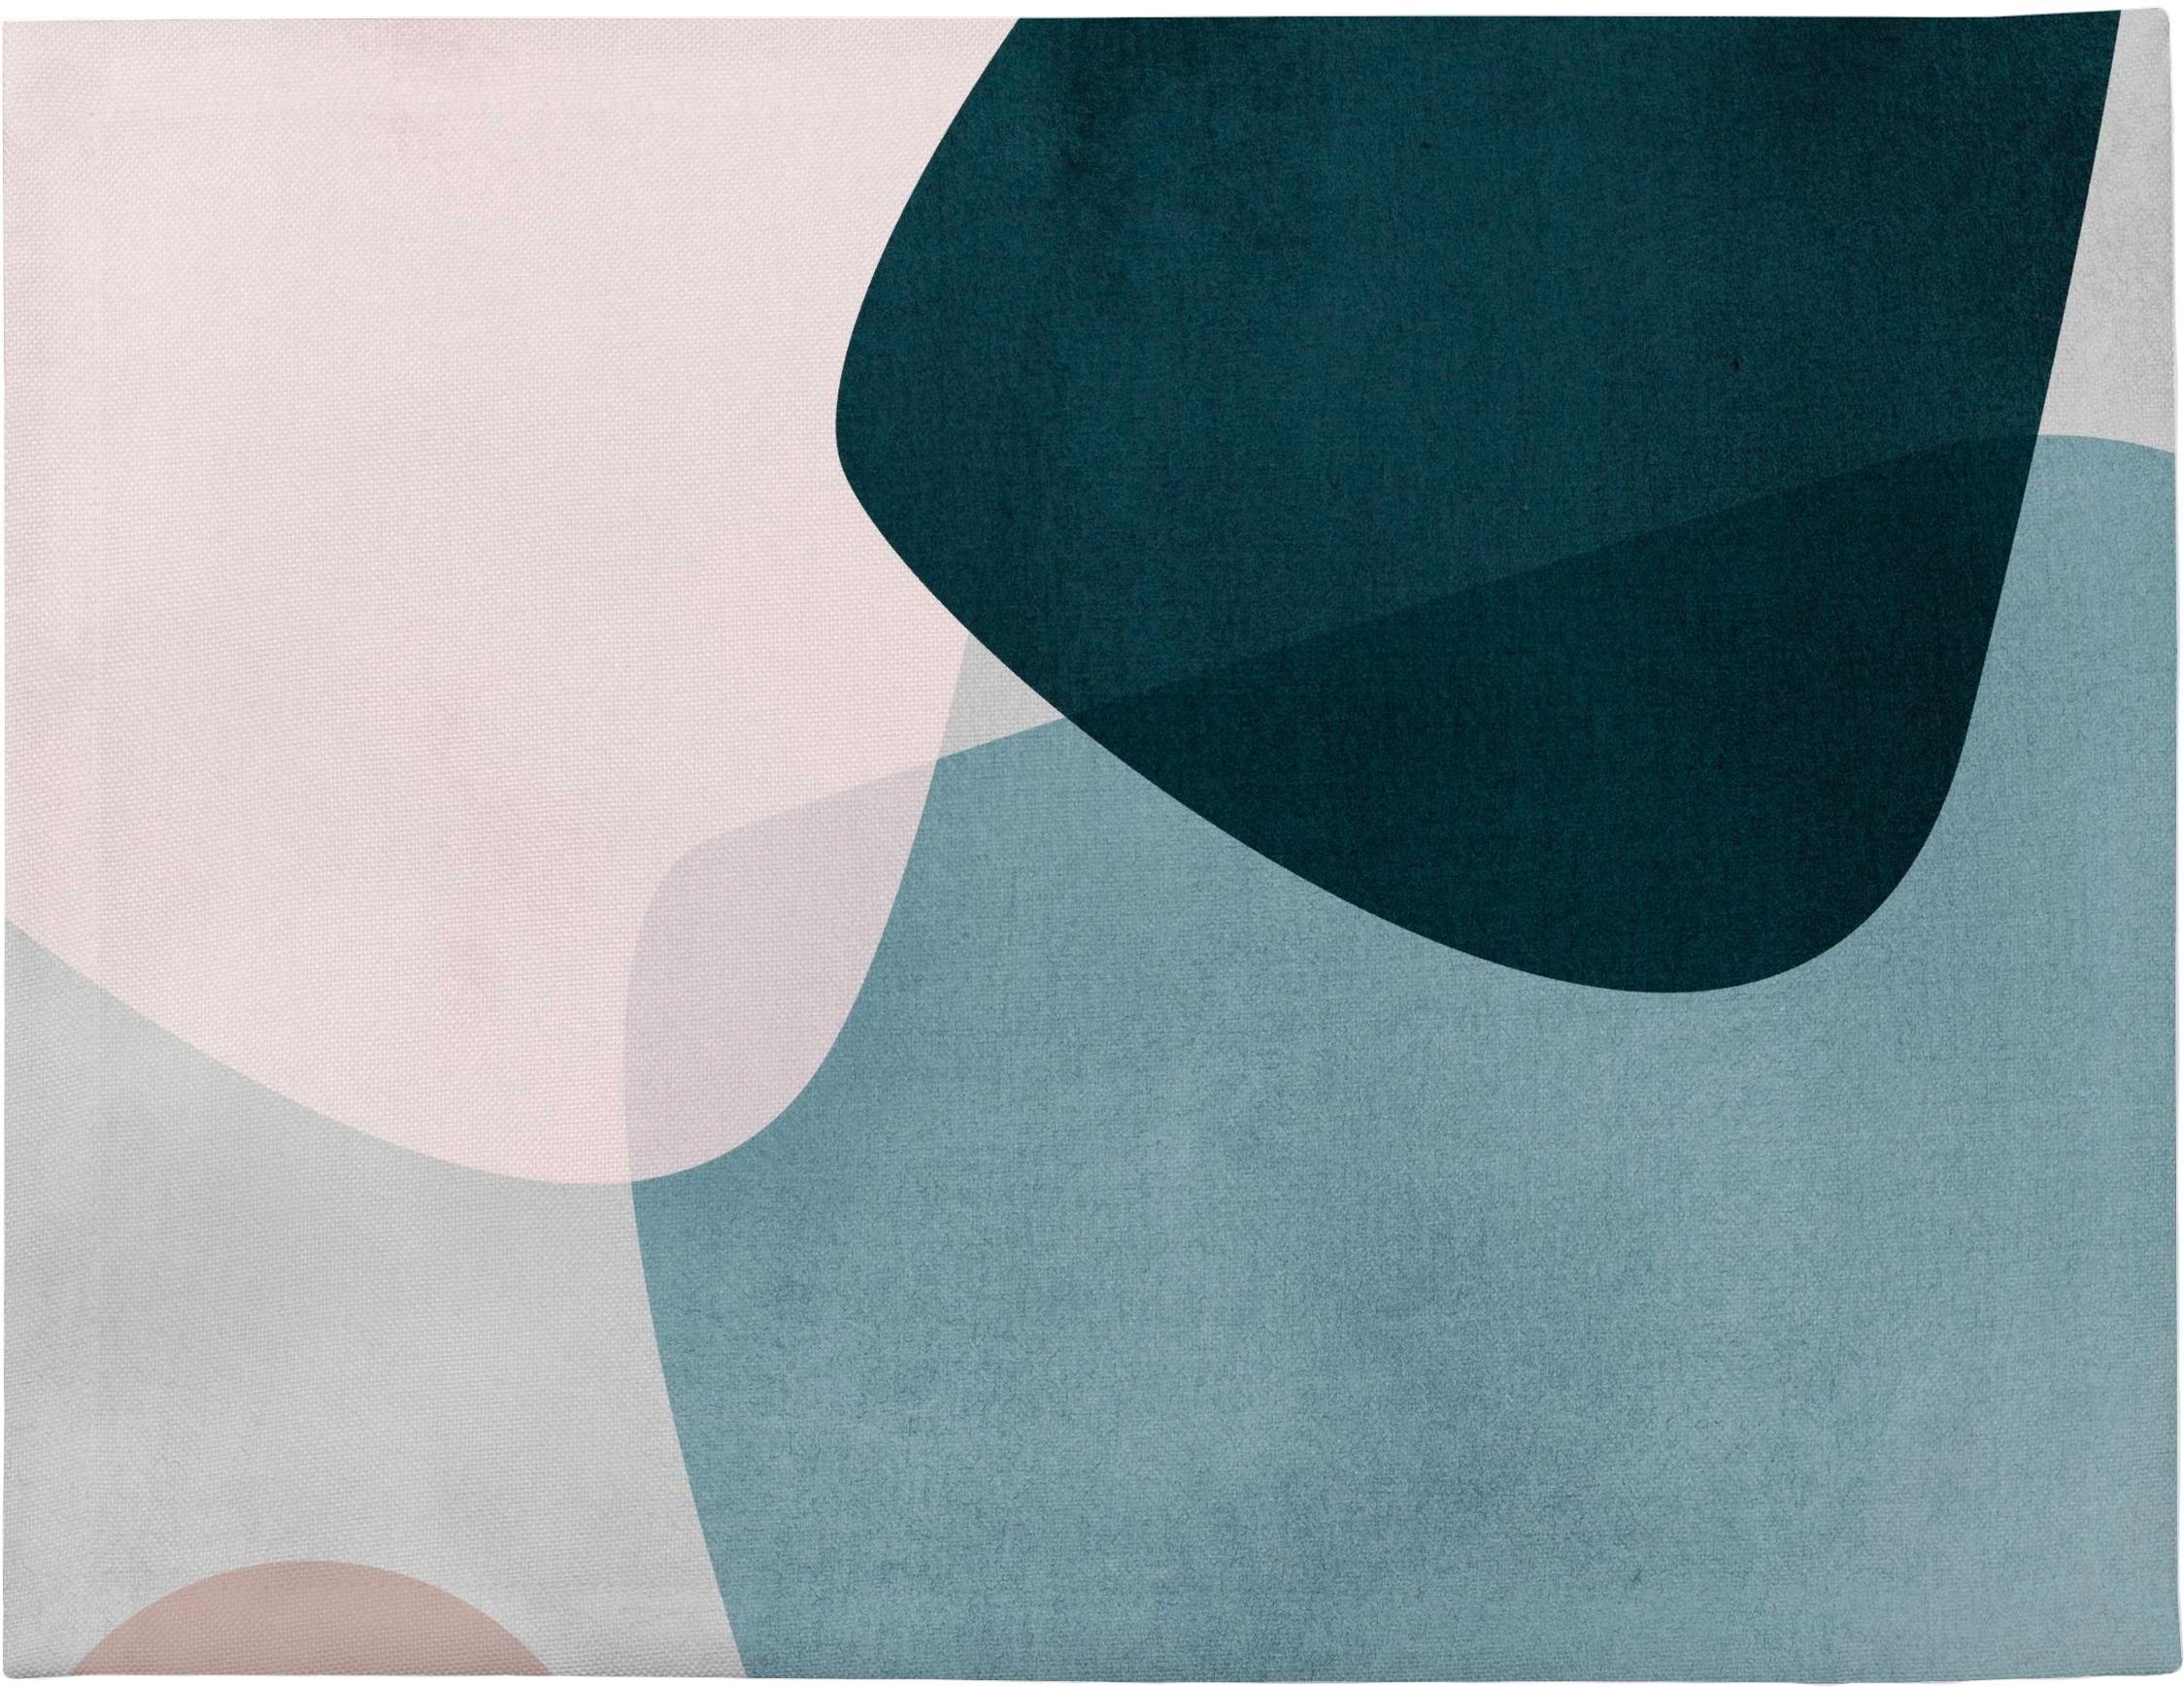 Tischsets Graphic, 4 Stück, Polyester, Dunkelblau, Blau, Grau, Rosa, 35 x 45 cm